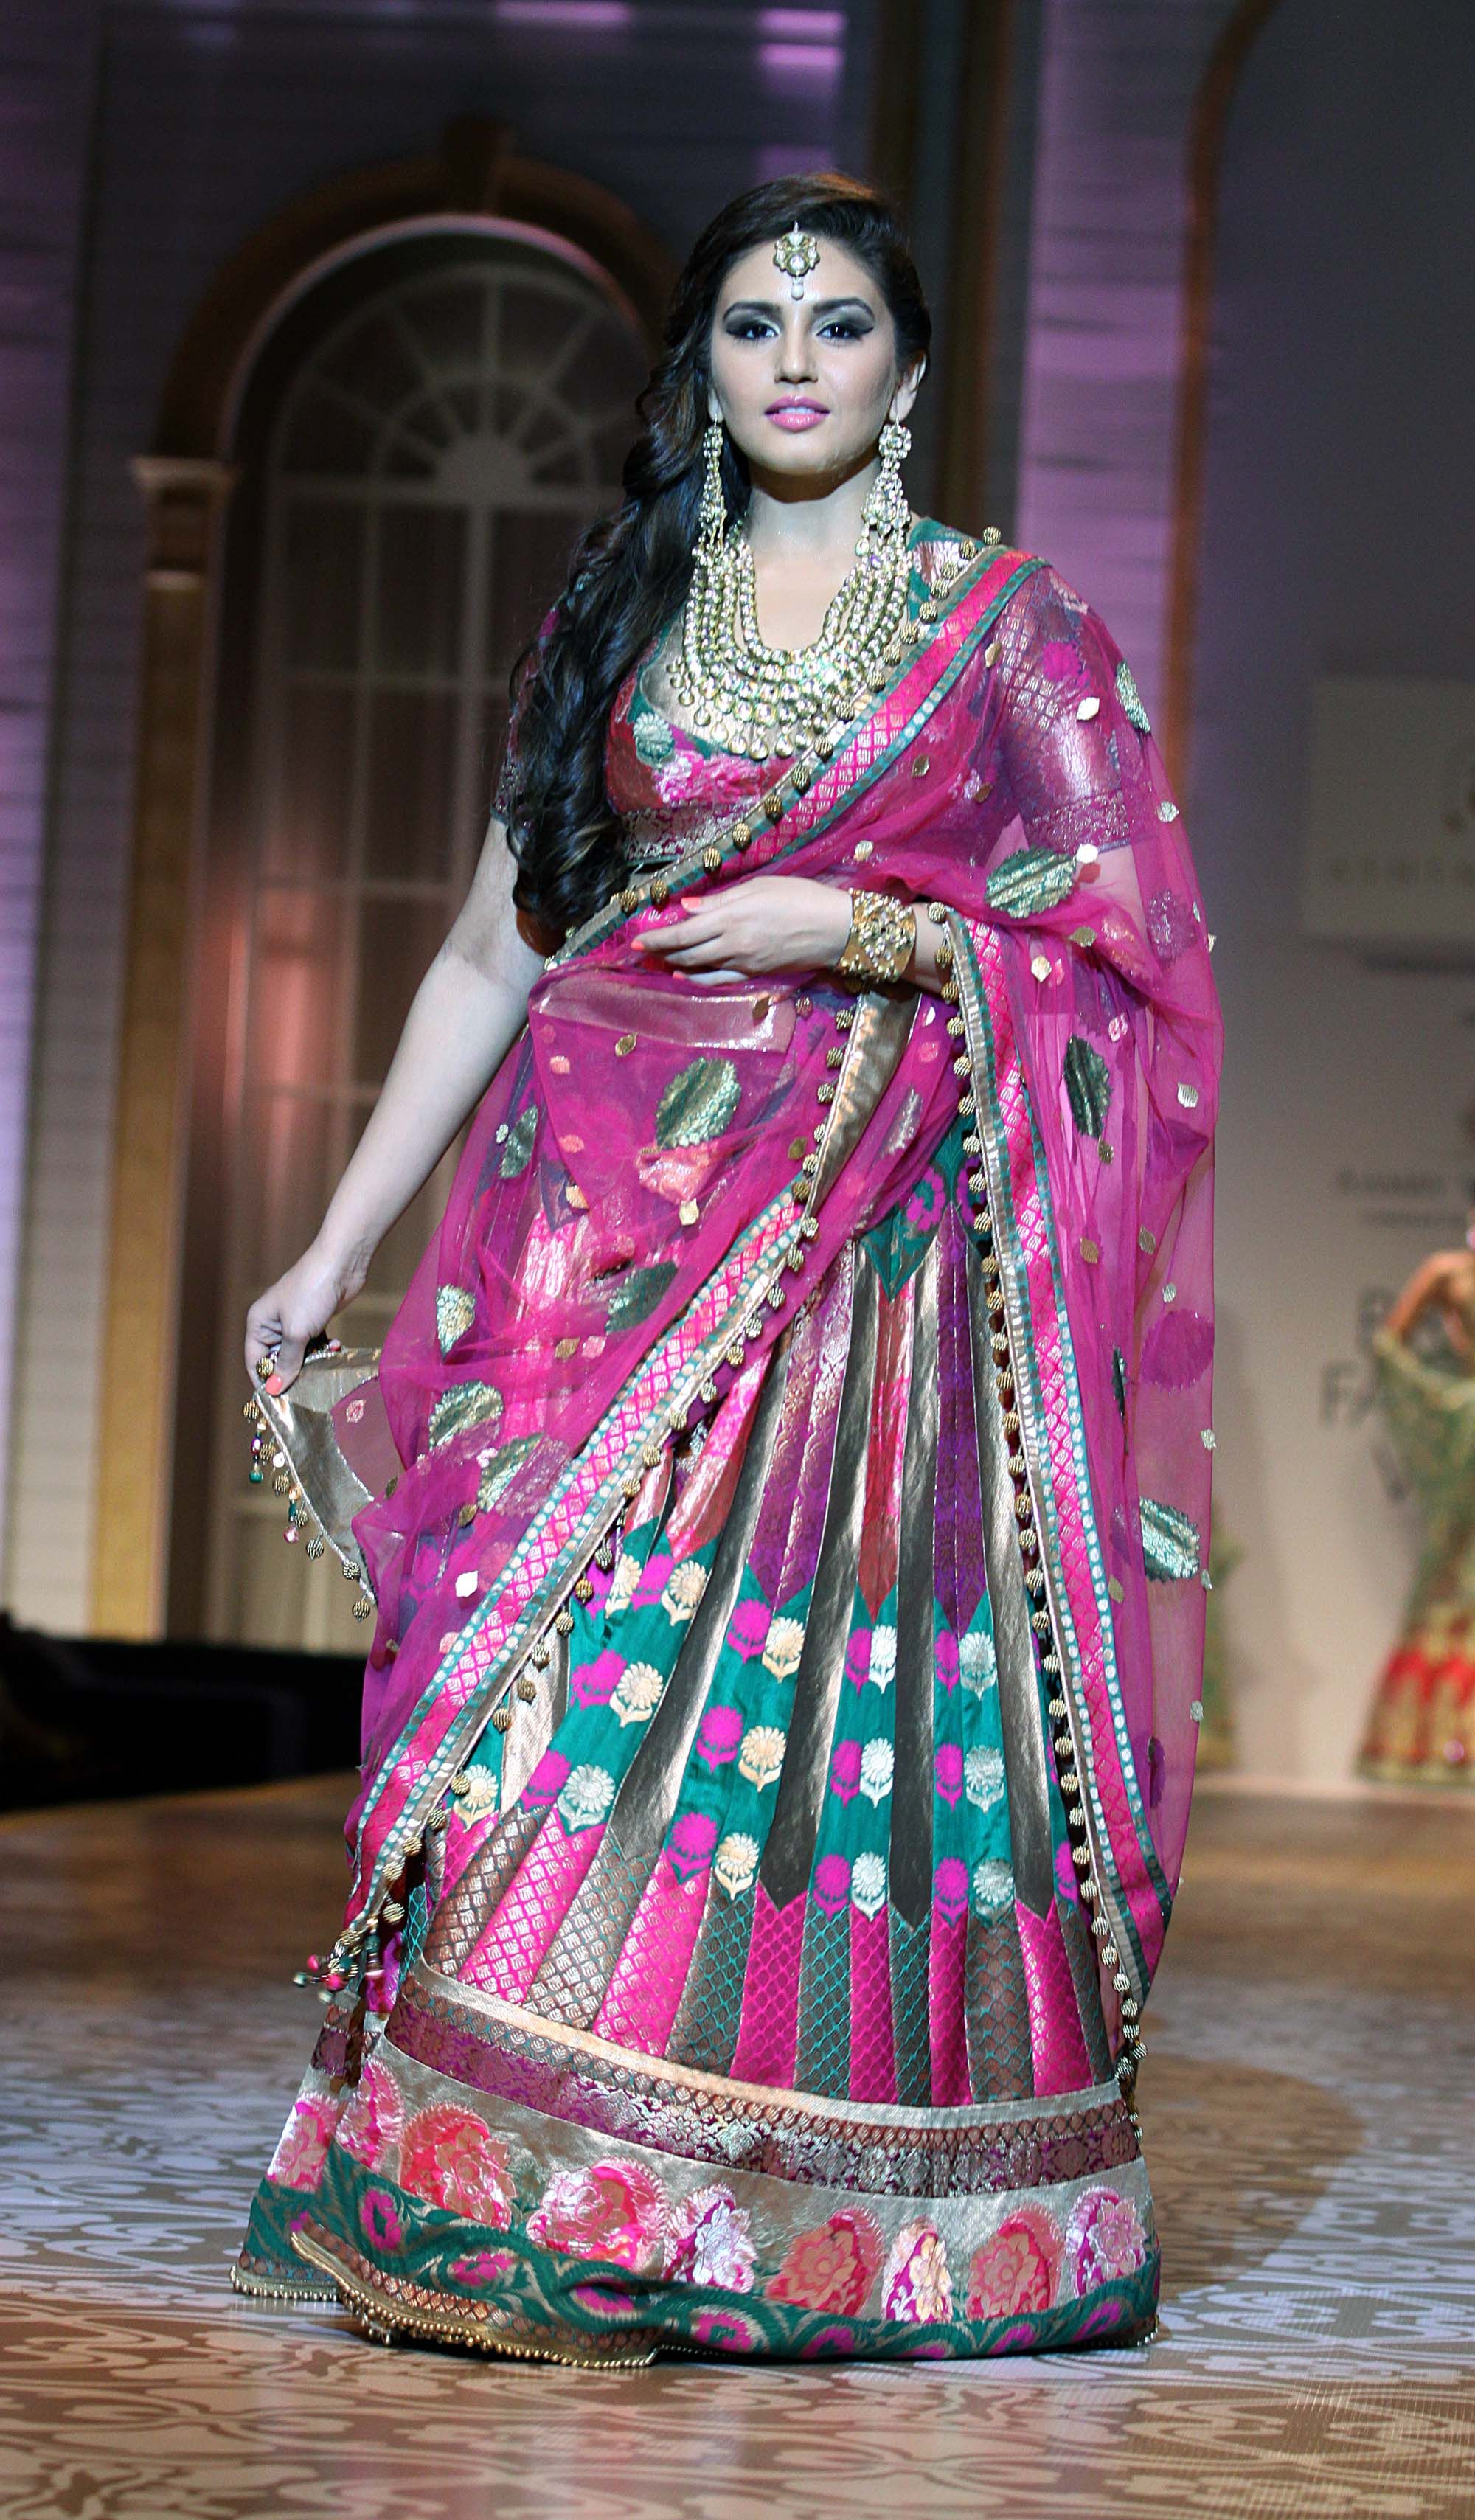 Huma-Qureshi-4.jpg 2,000×3,417 pixels   Engagement/Wedding Ideas ...